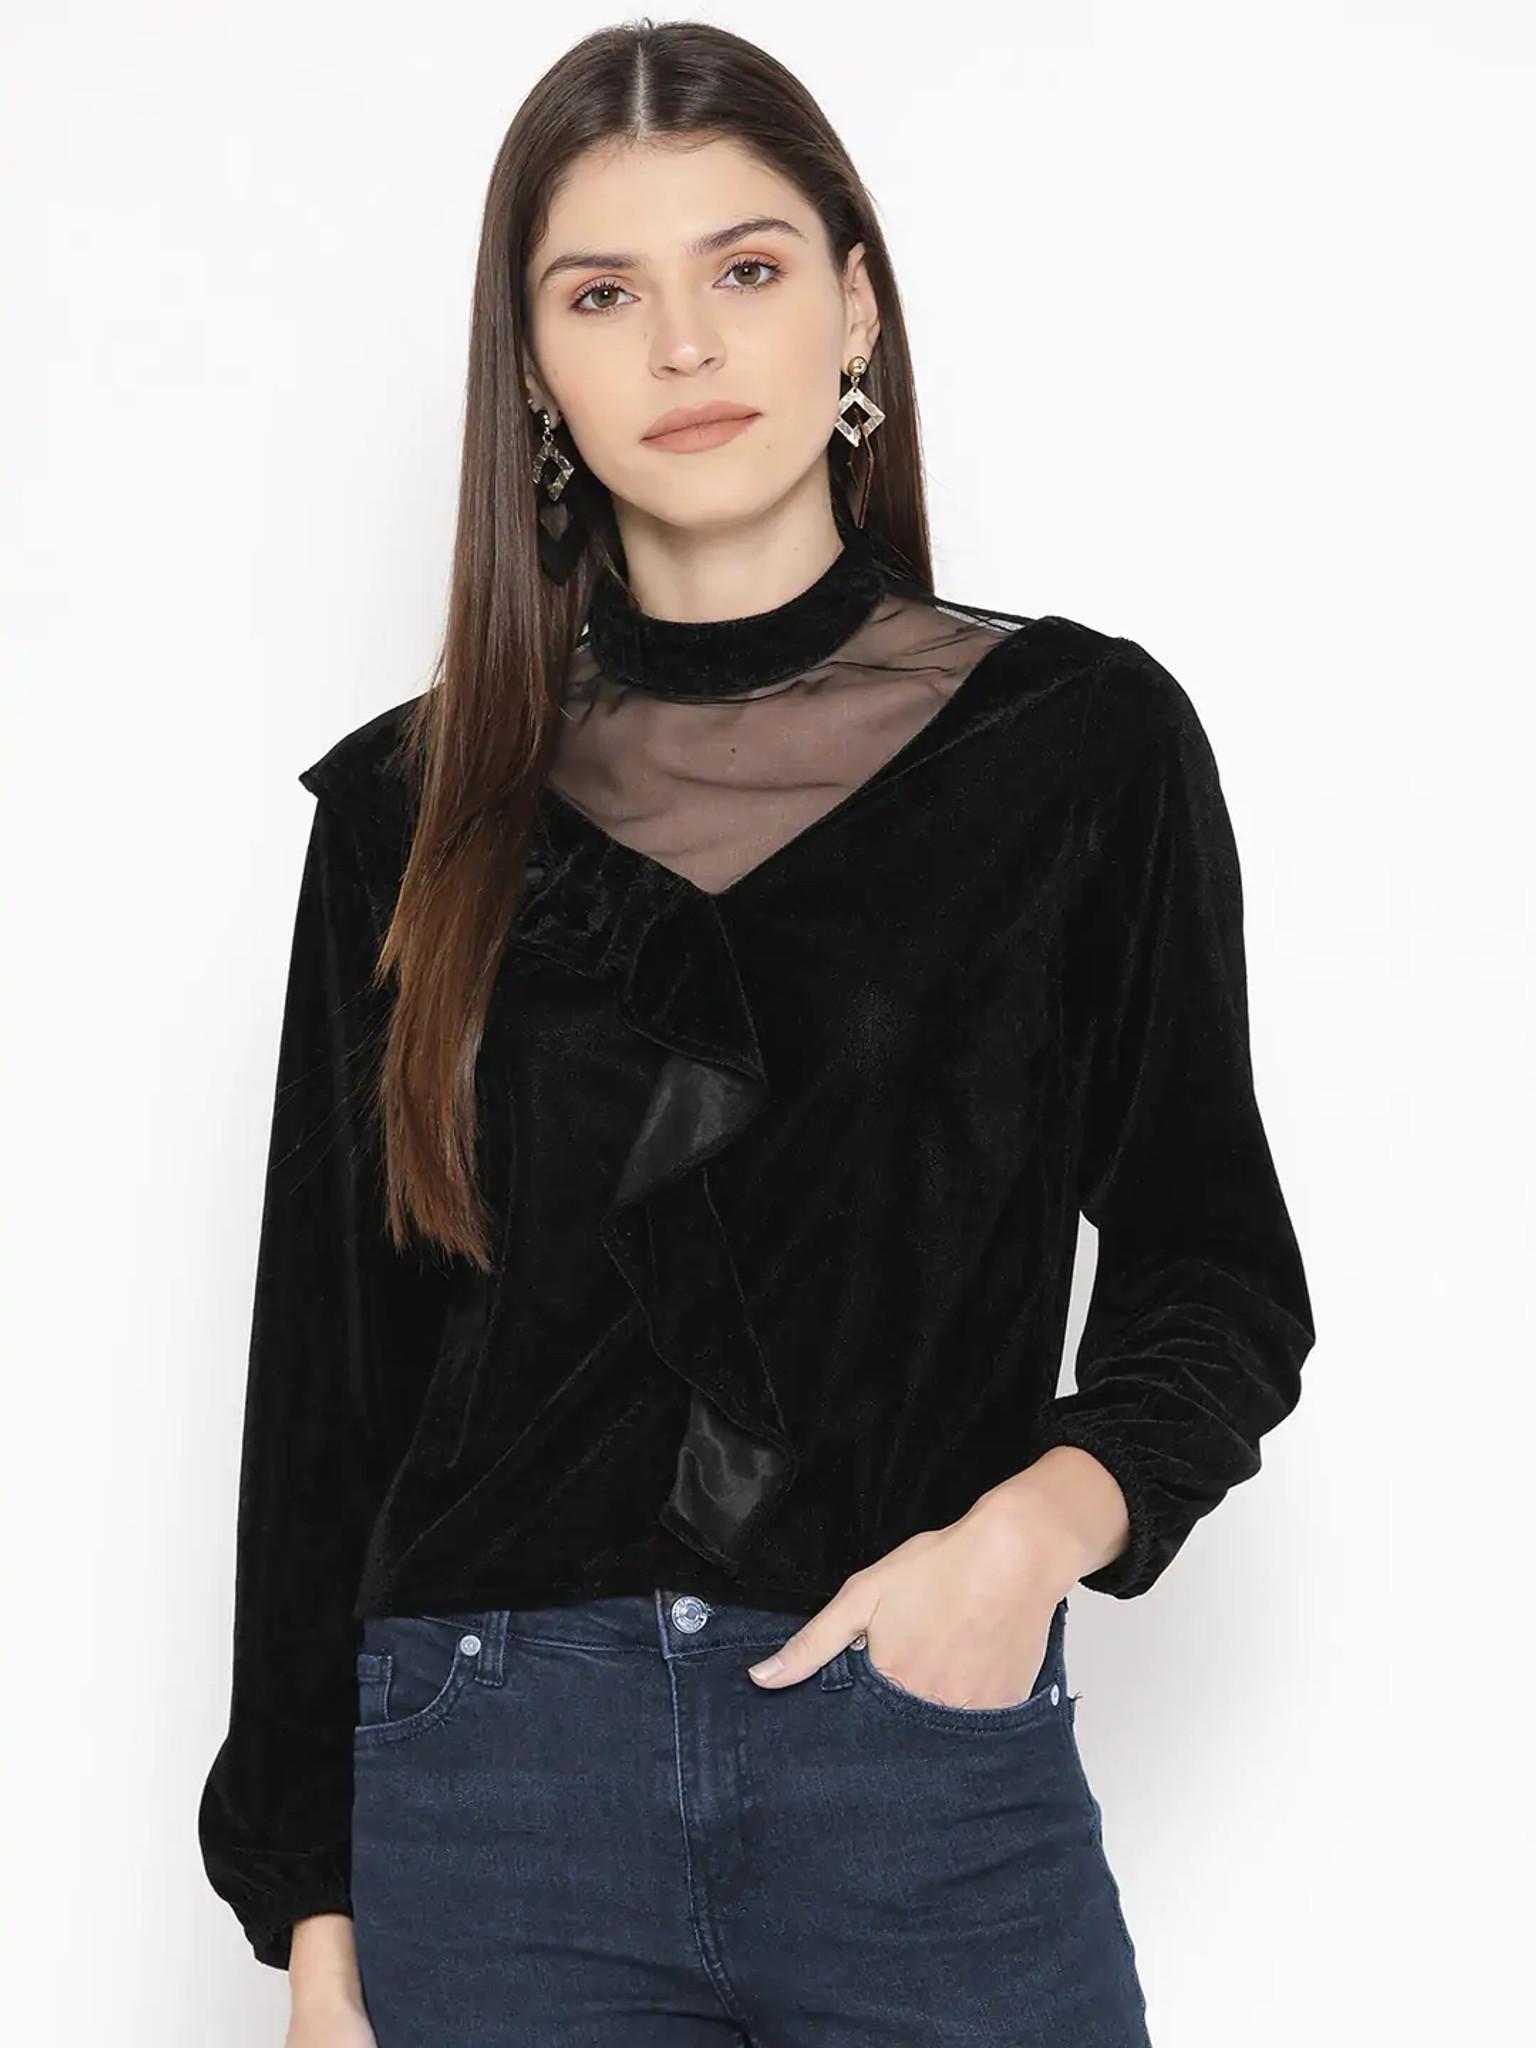 Fifth Avenue Womens Mesh Insert Detail Velvet Stitched Western Top - FAWWT24 - Black